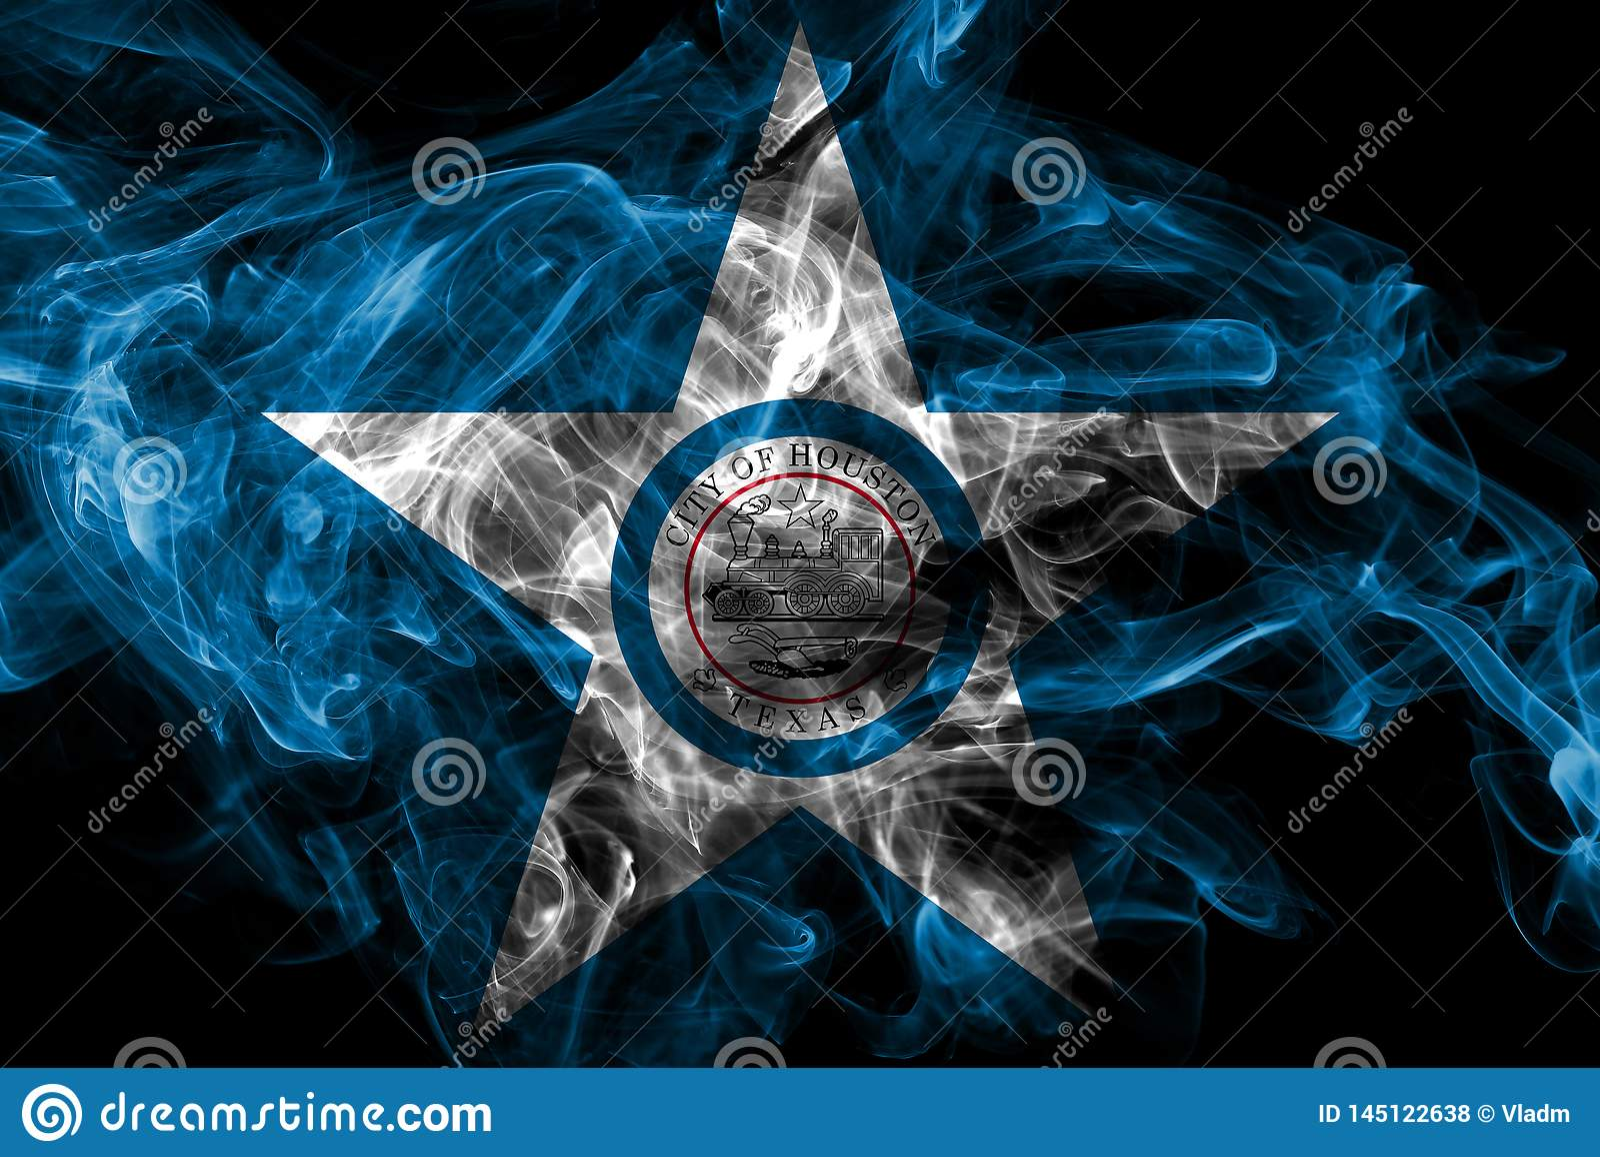 Flagga f?r Houston stadsr?k, Texas State, Amerikas f?renta stater